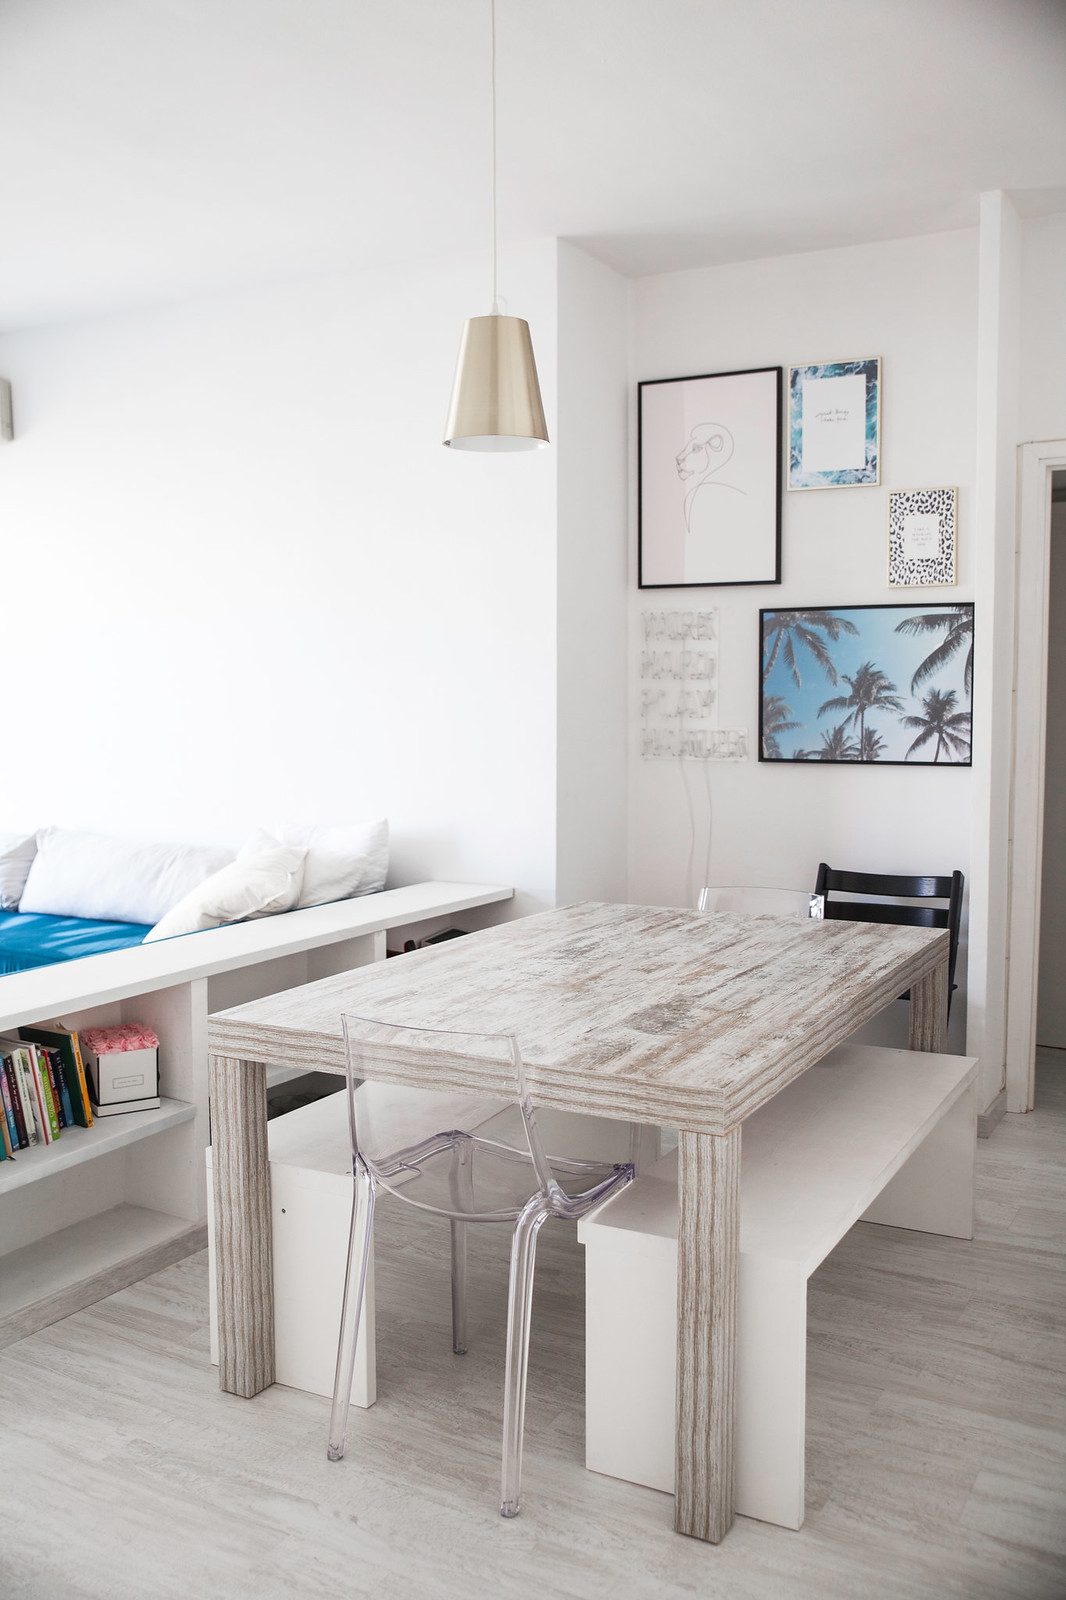 03_5_consejos_para_conseguir_decoracion_estilo_nordico_parquet_barcelona_buen_precio_deco_inspo_influencer_barcelona_theguestgirl_aloha_home